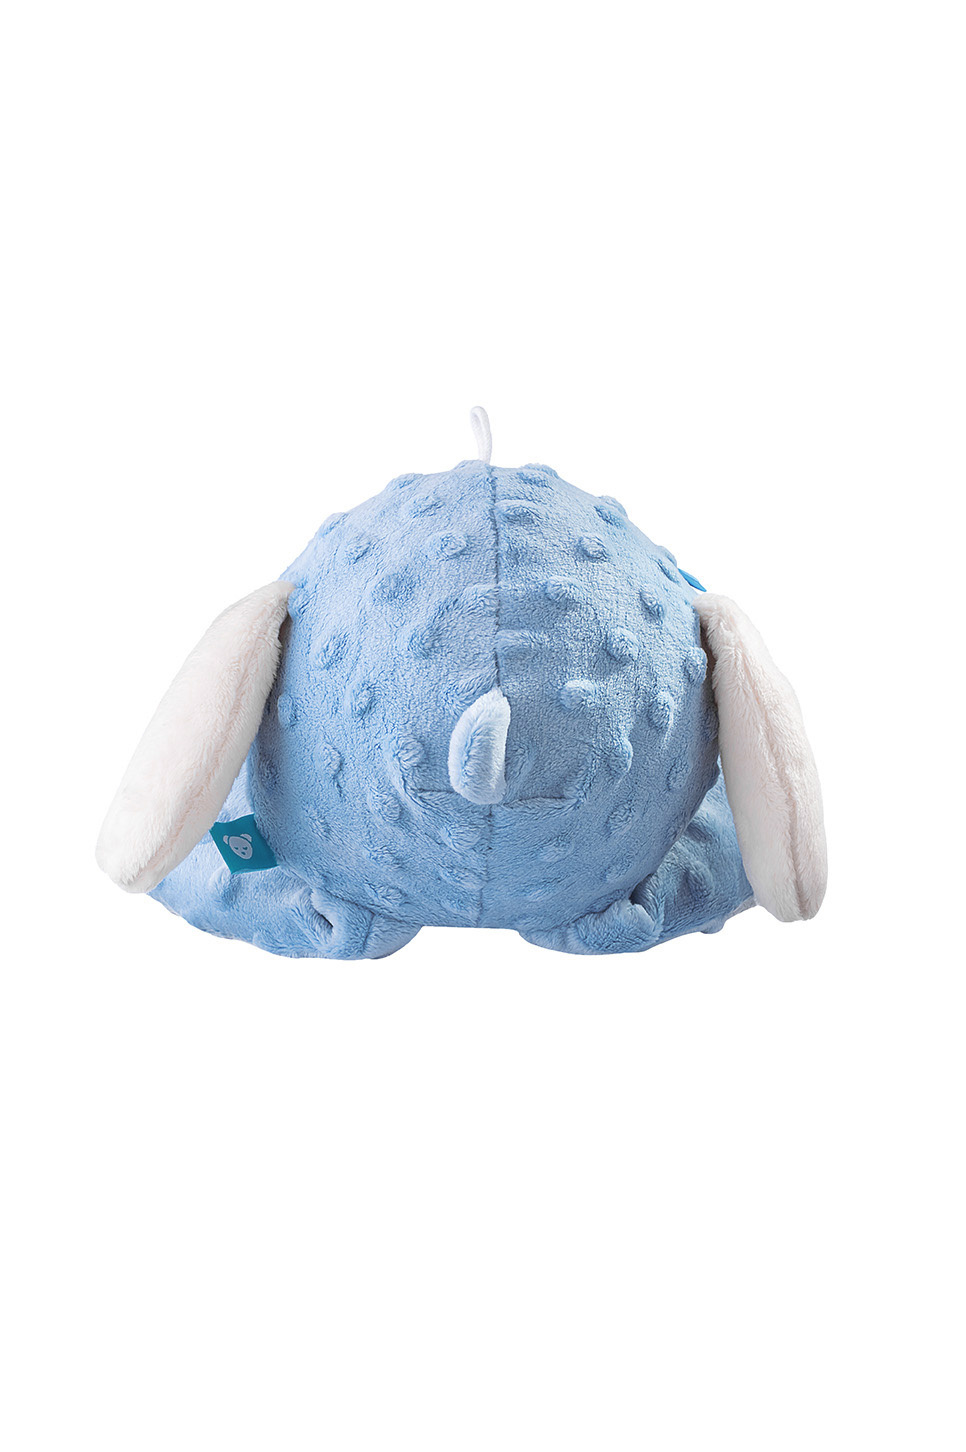 myHummy Snoozy Premium App - Azzurro